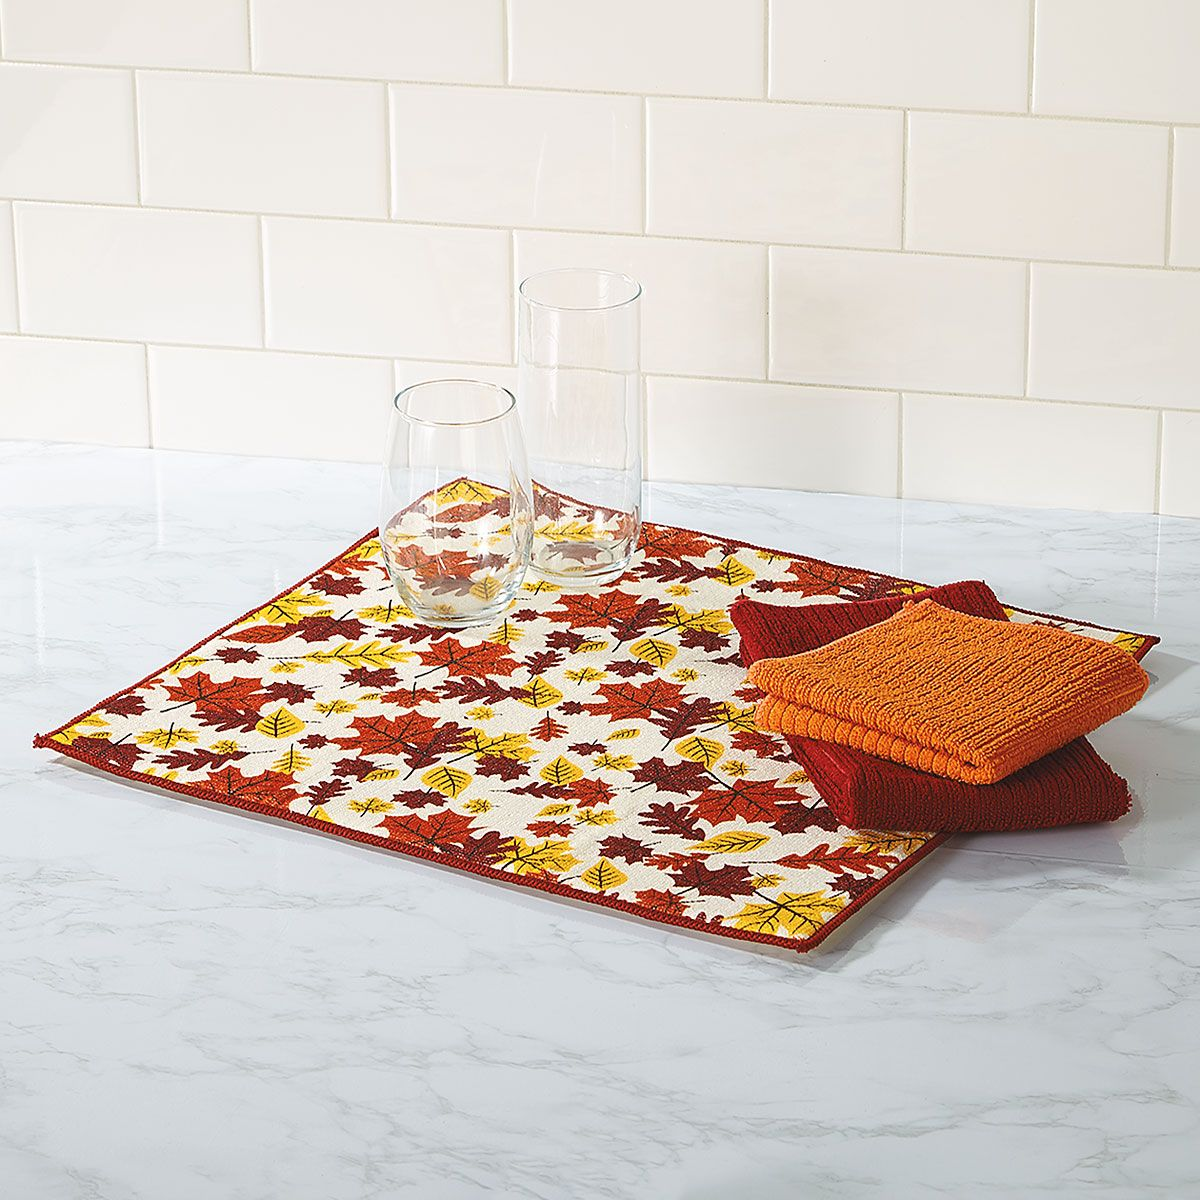 Leaves Drying Mat/Towel/Dishcloth Set